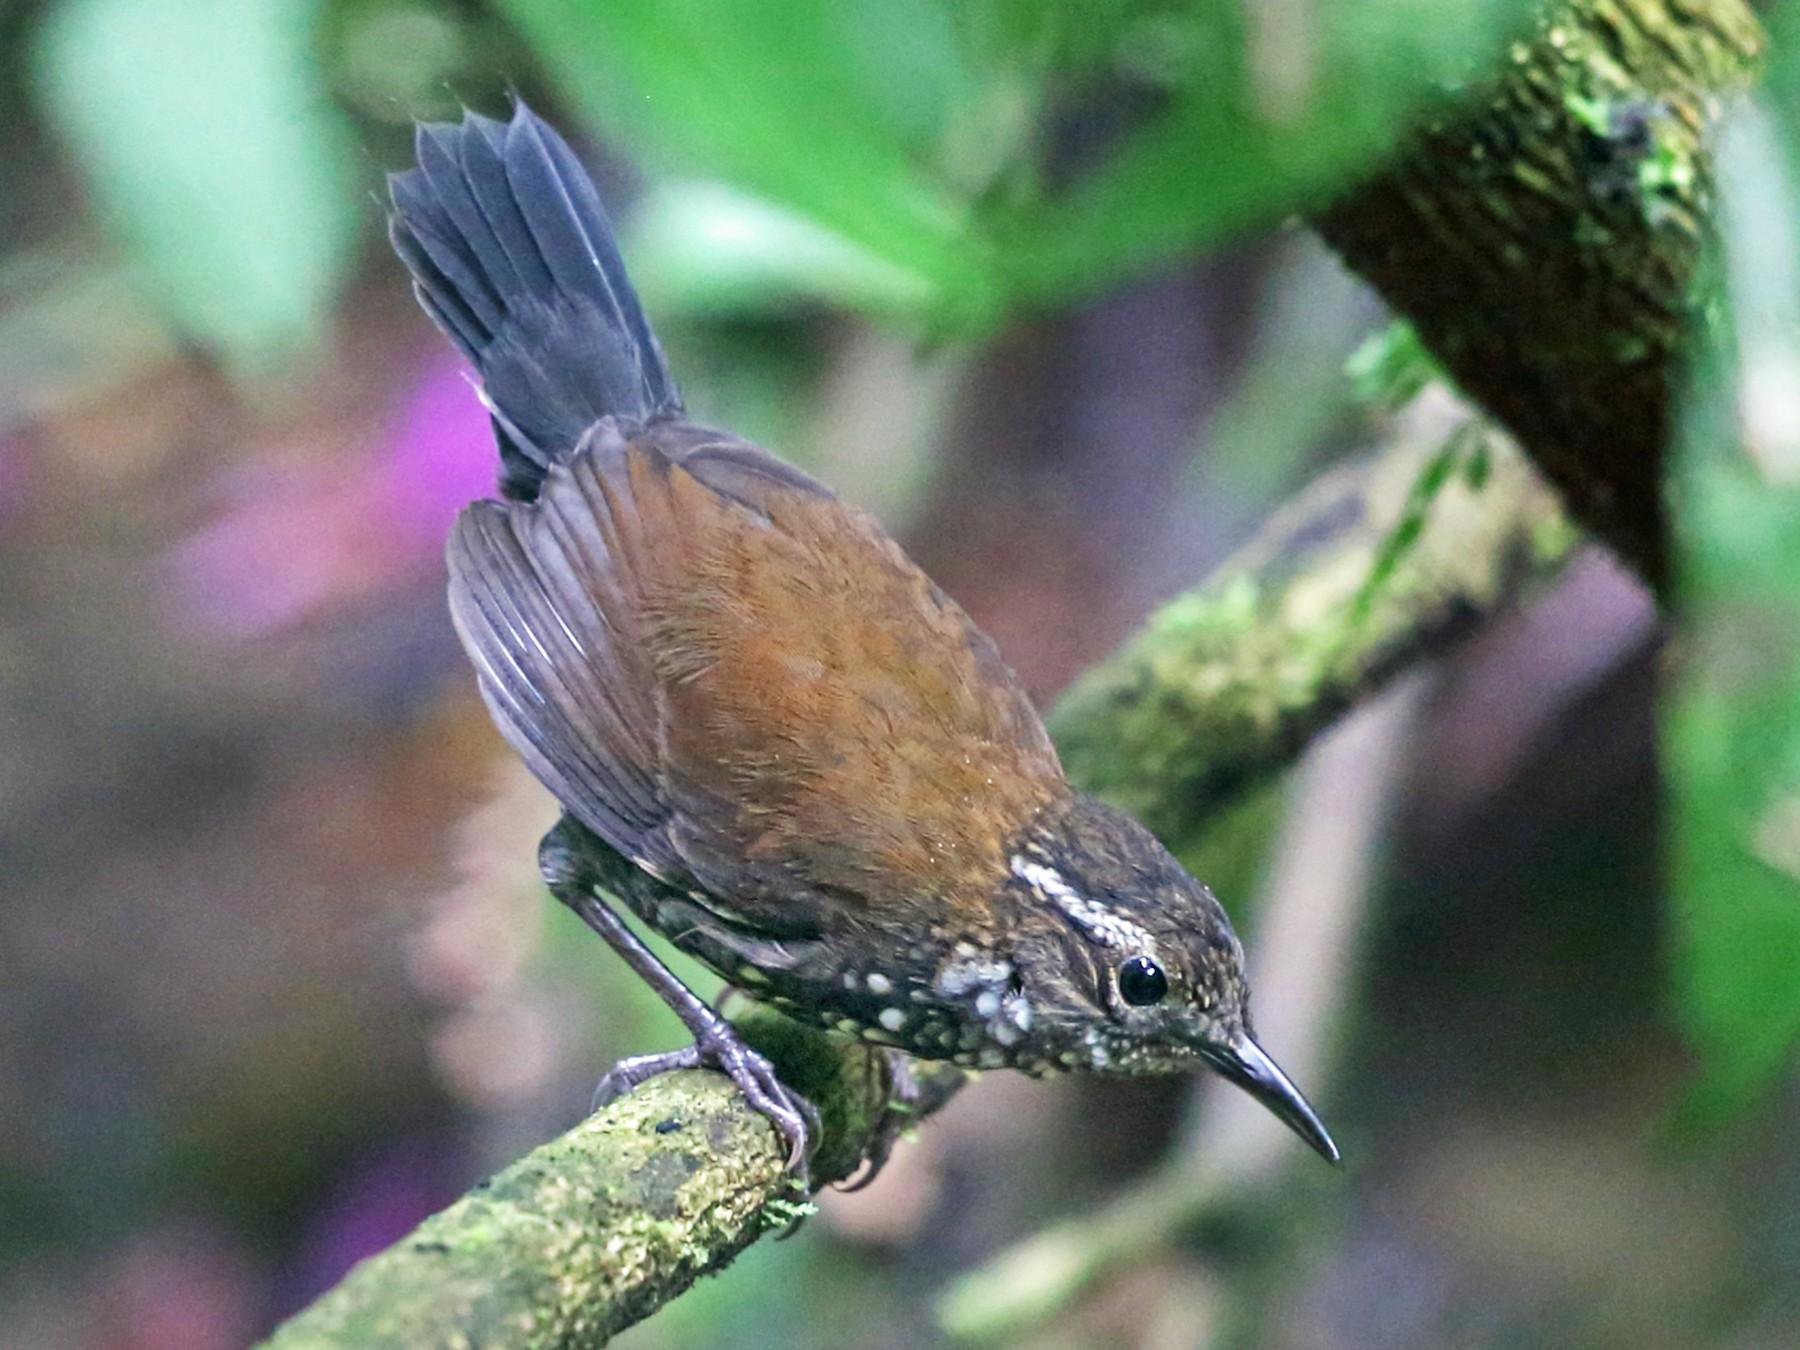 Sharp-tailed Streamcreeper - Nigel Voaden